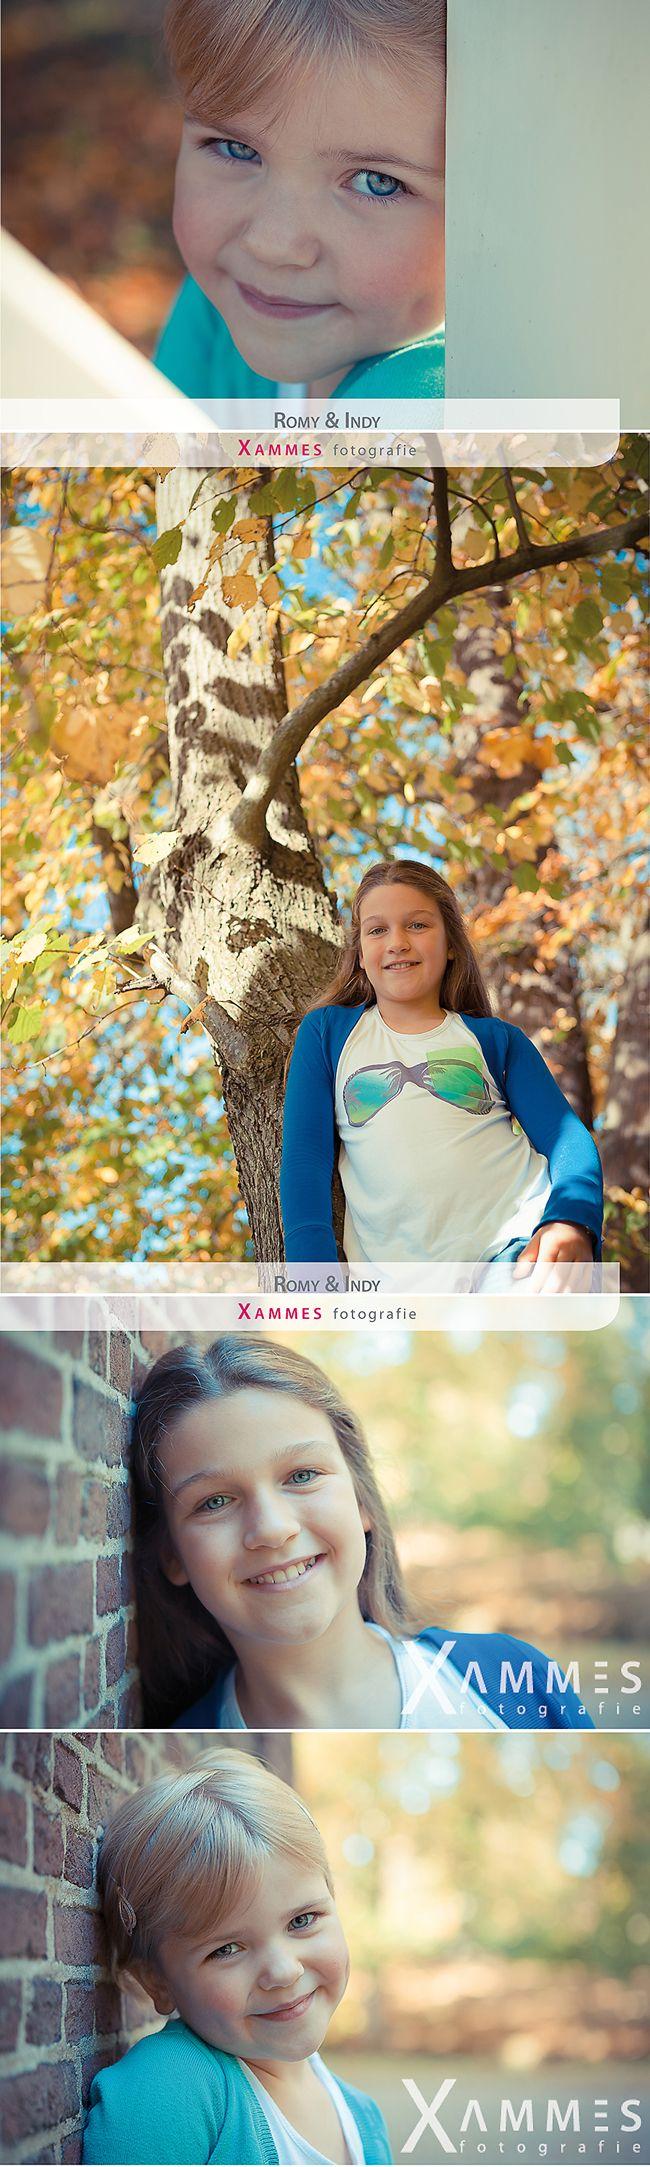 Romy en Indy, Kinderfotografie Elswout, Xammes fotografie